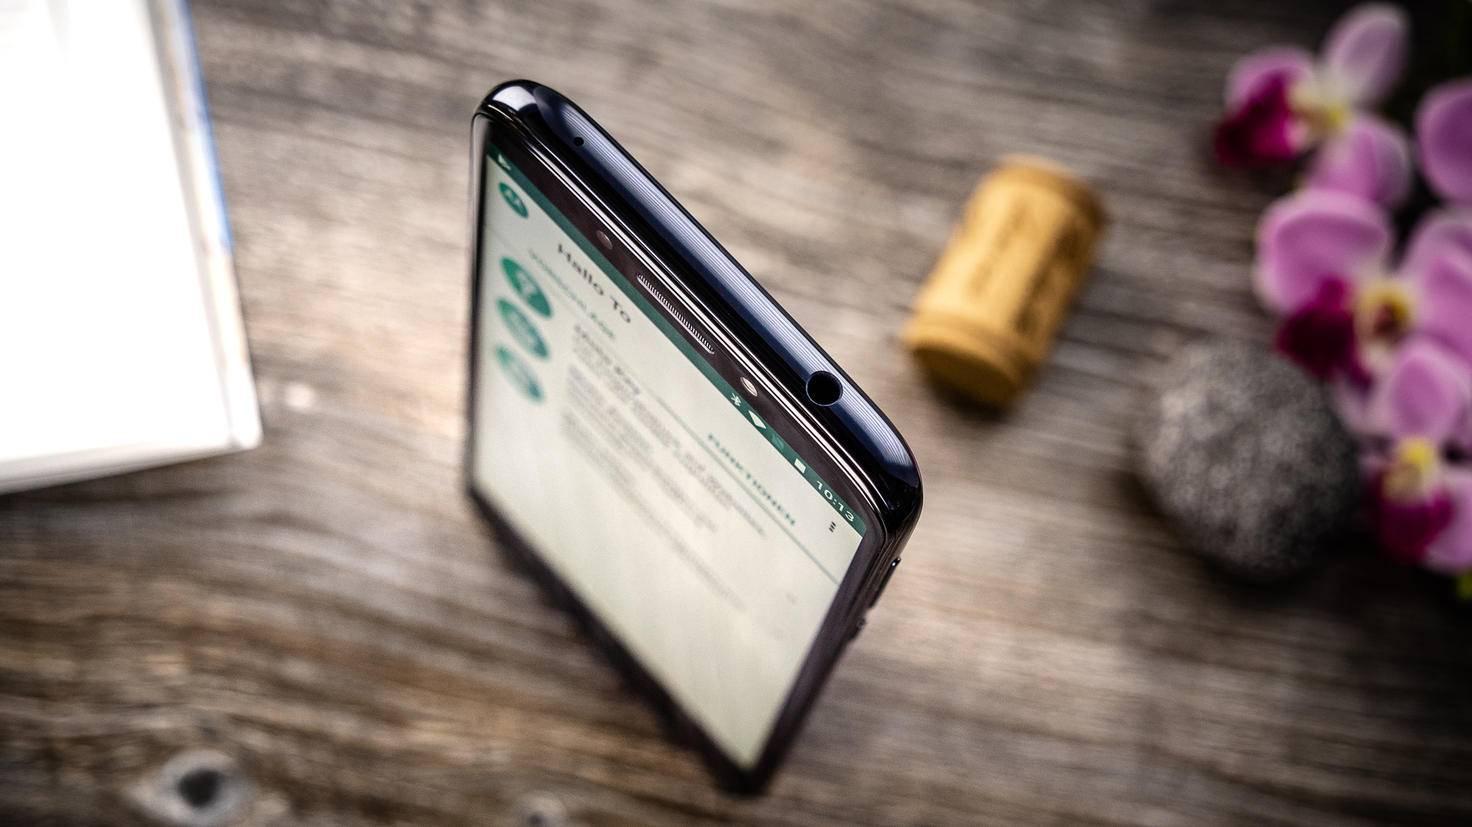 Motorola-Moto-G6-Play-TURN-ON-6